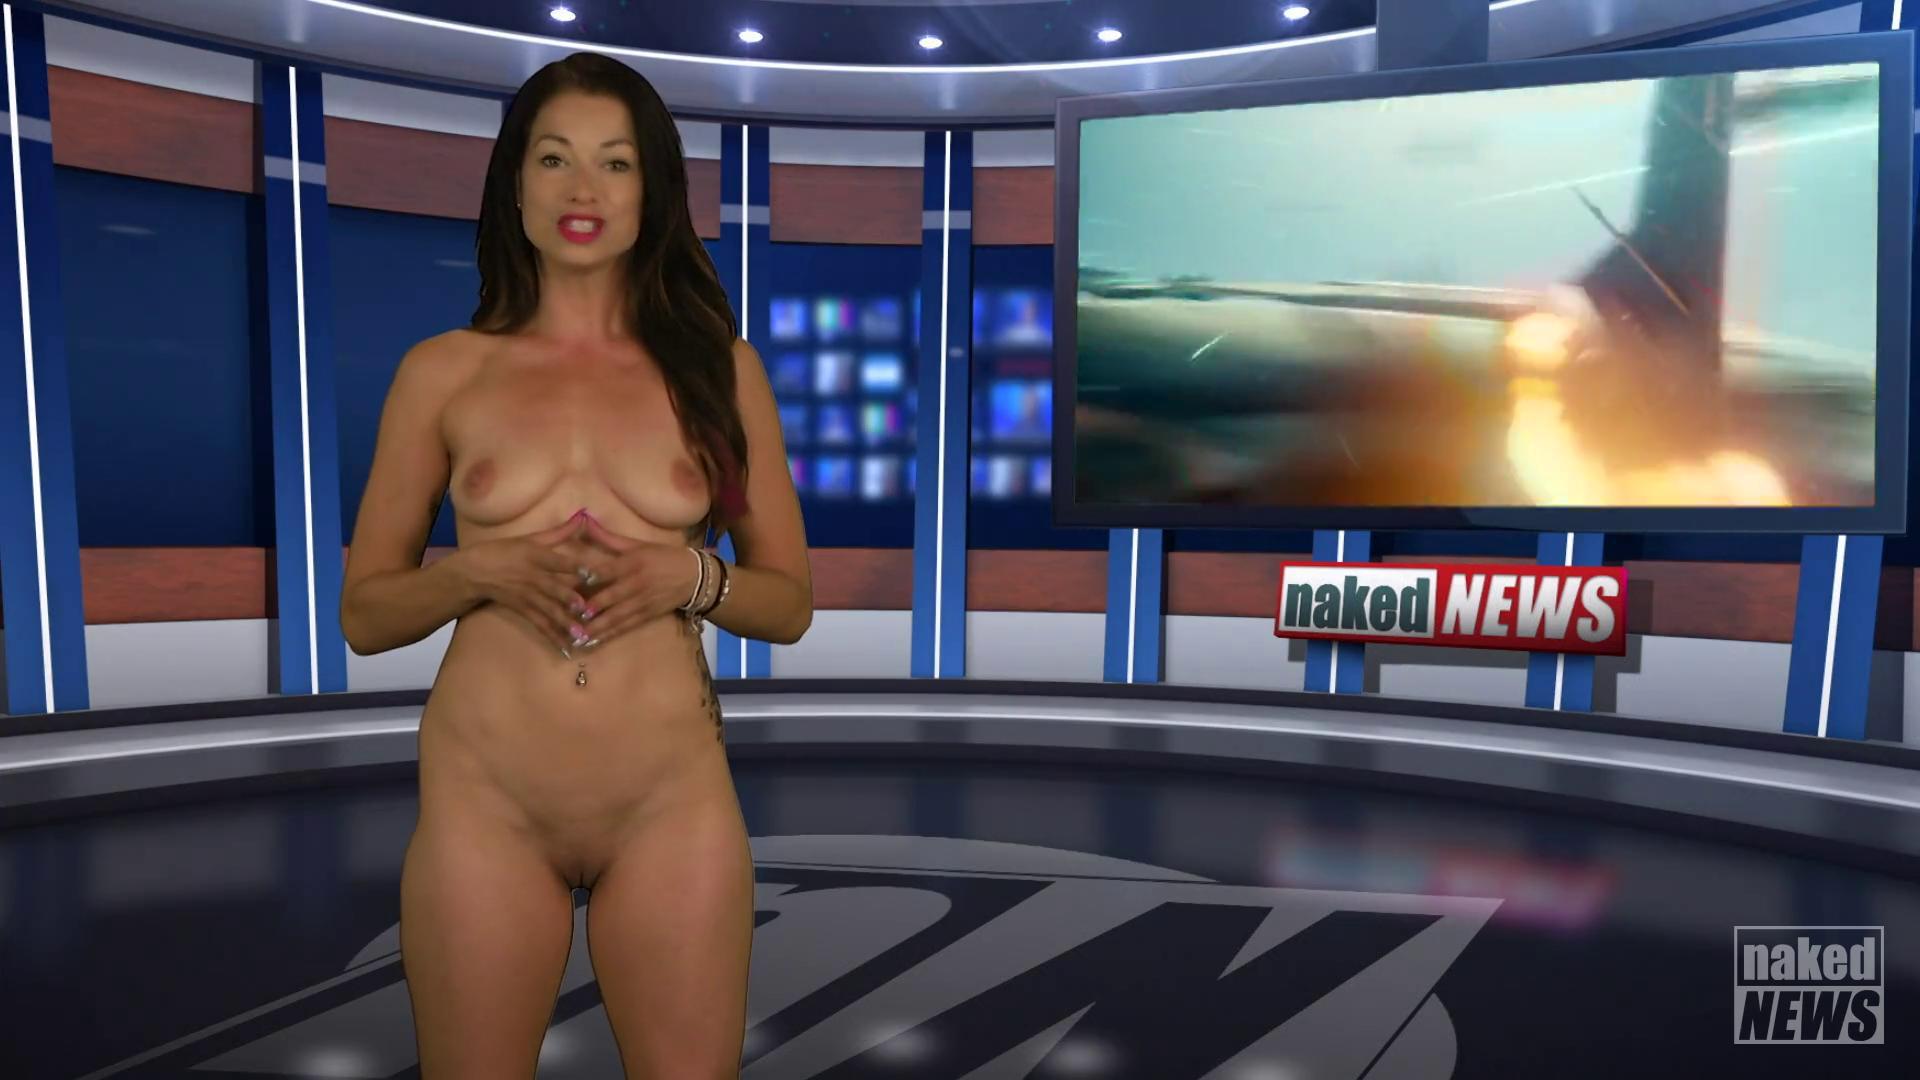 Romesh ranganathan strips off for naked news